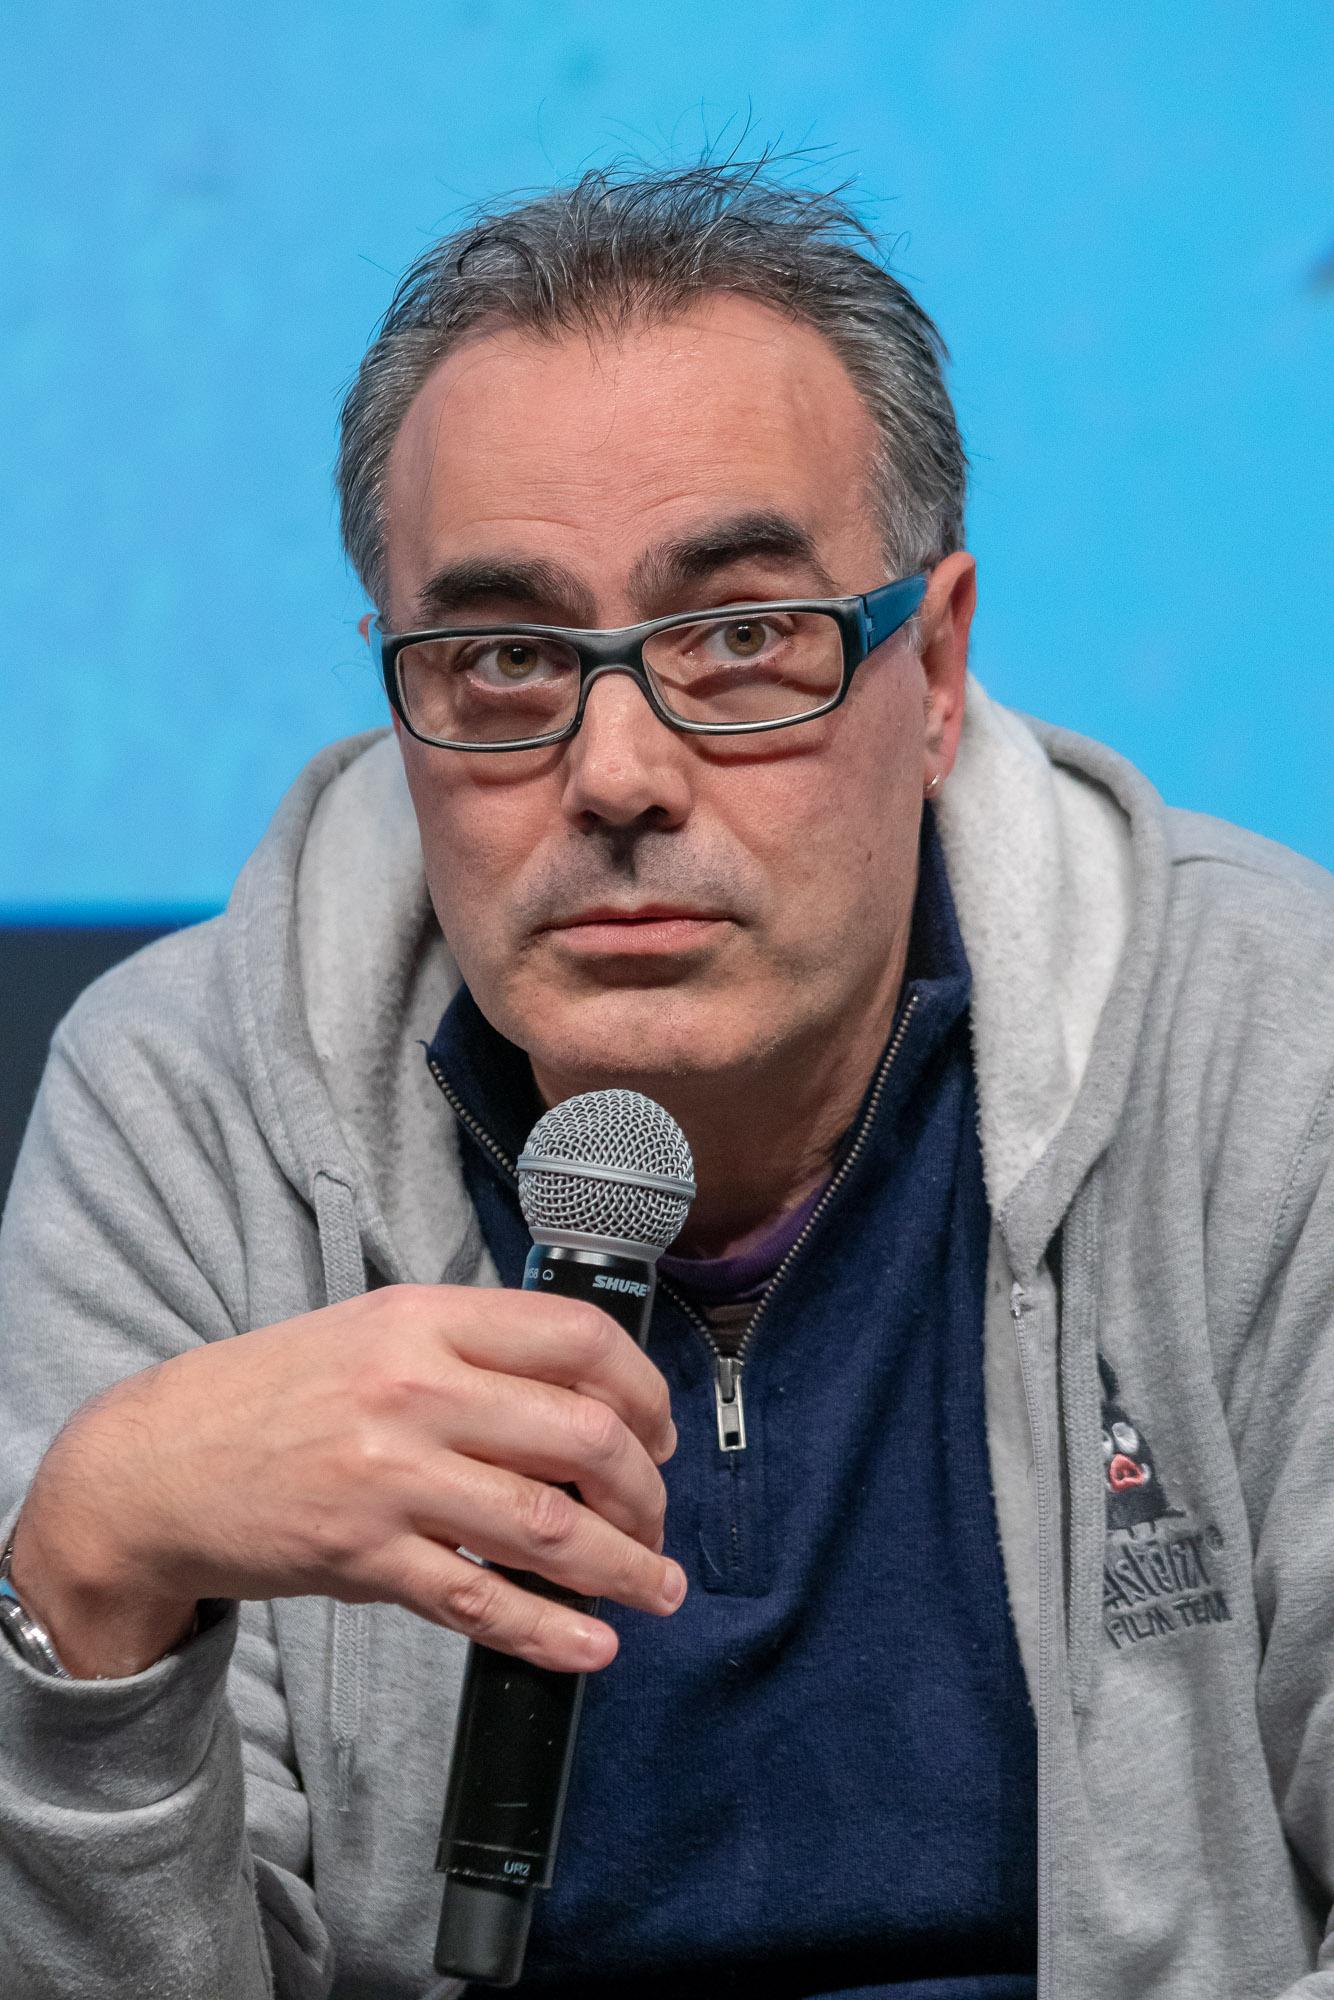 David Dulac